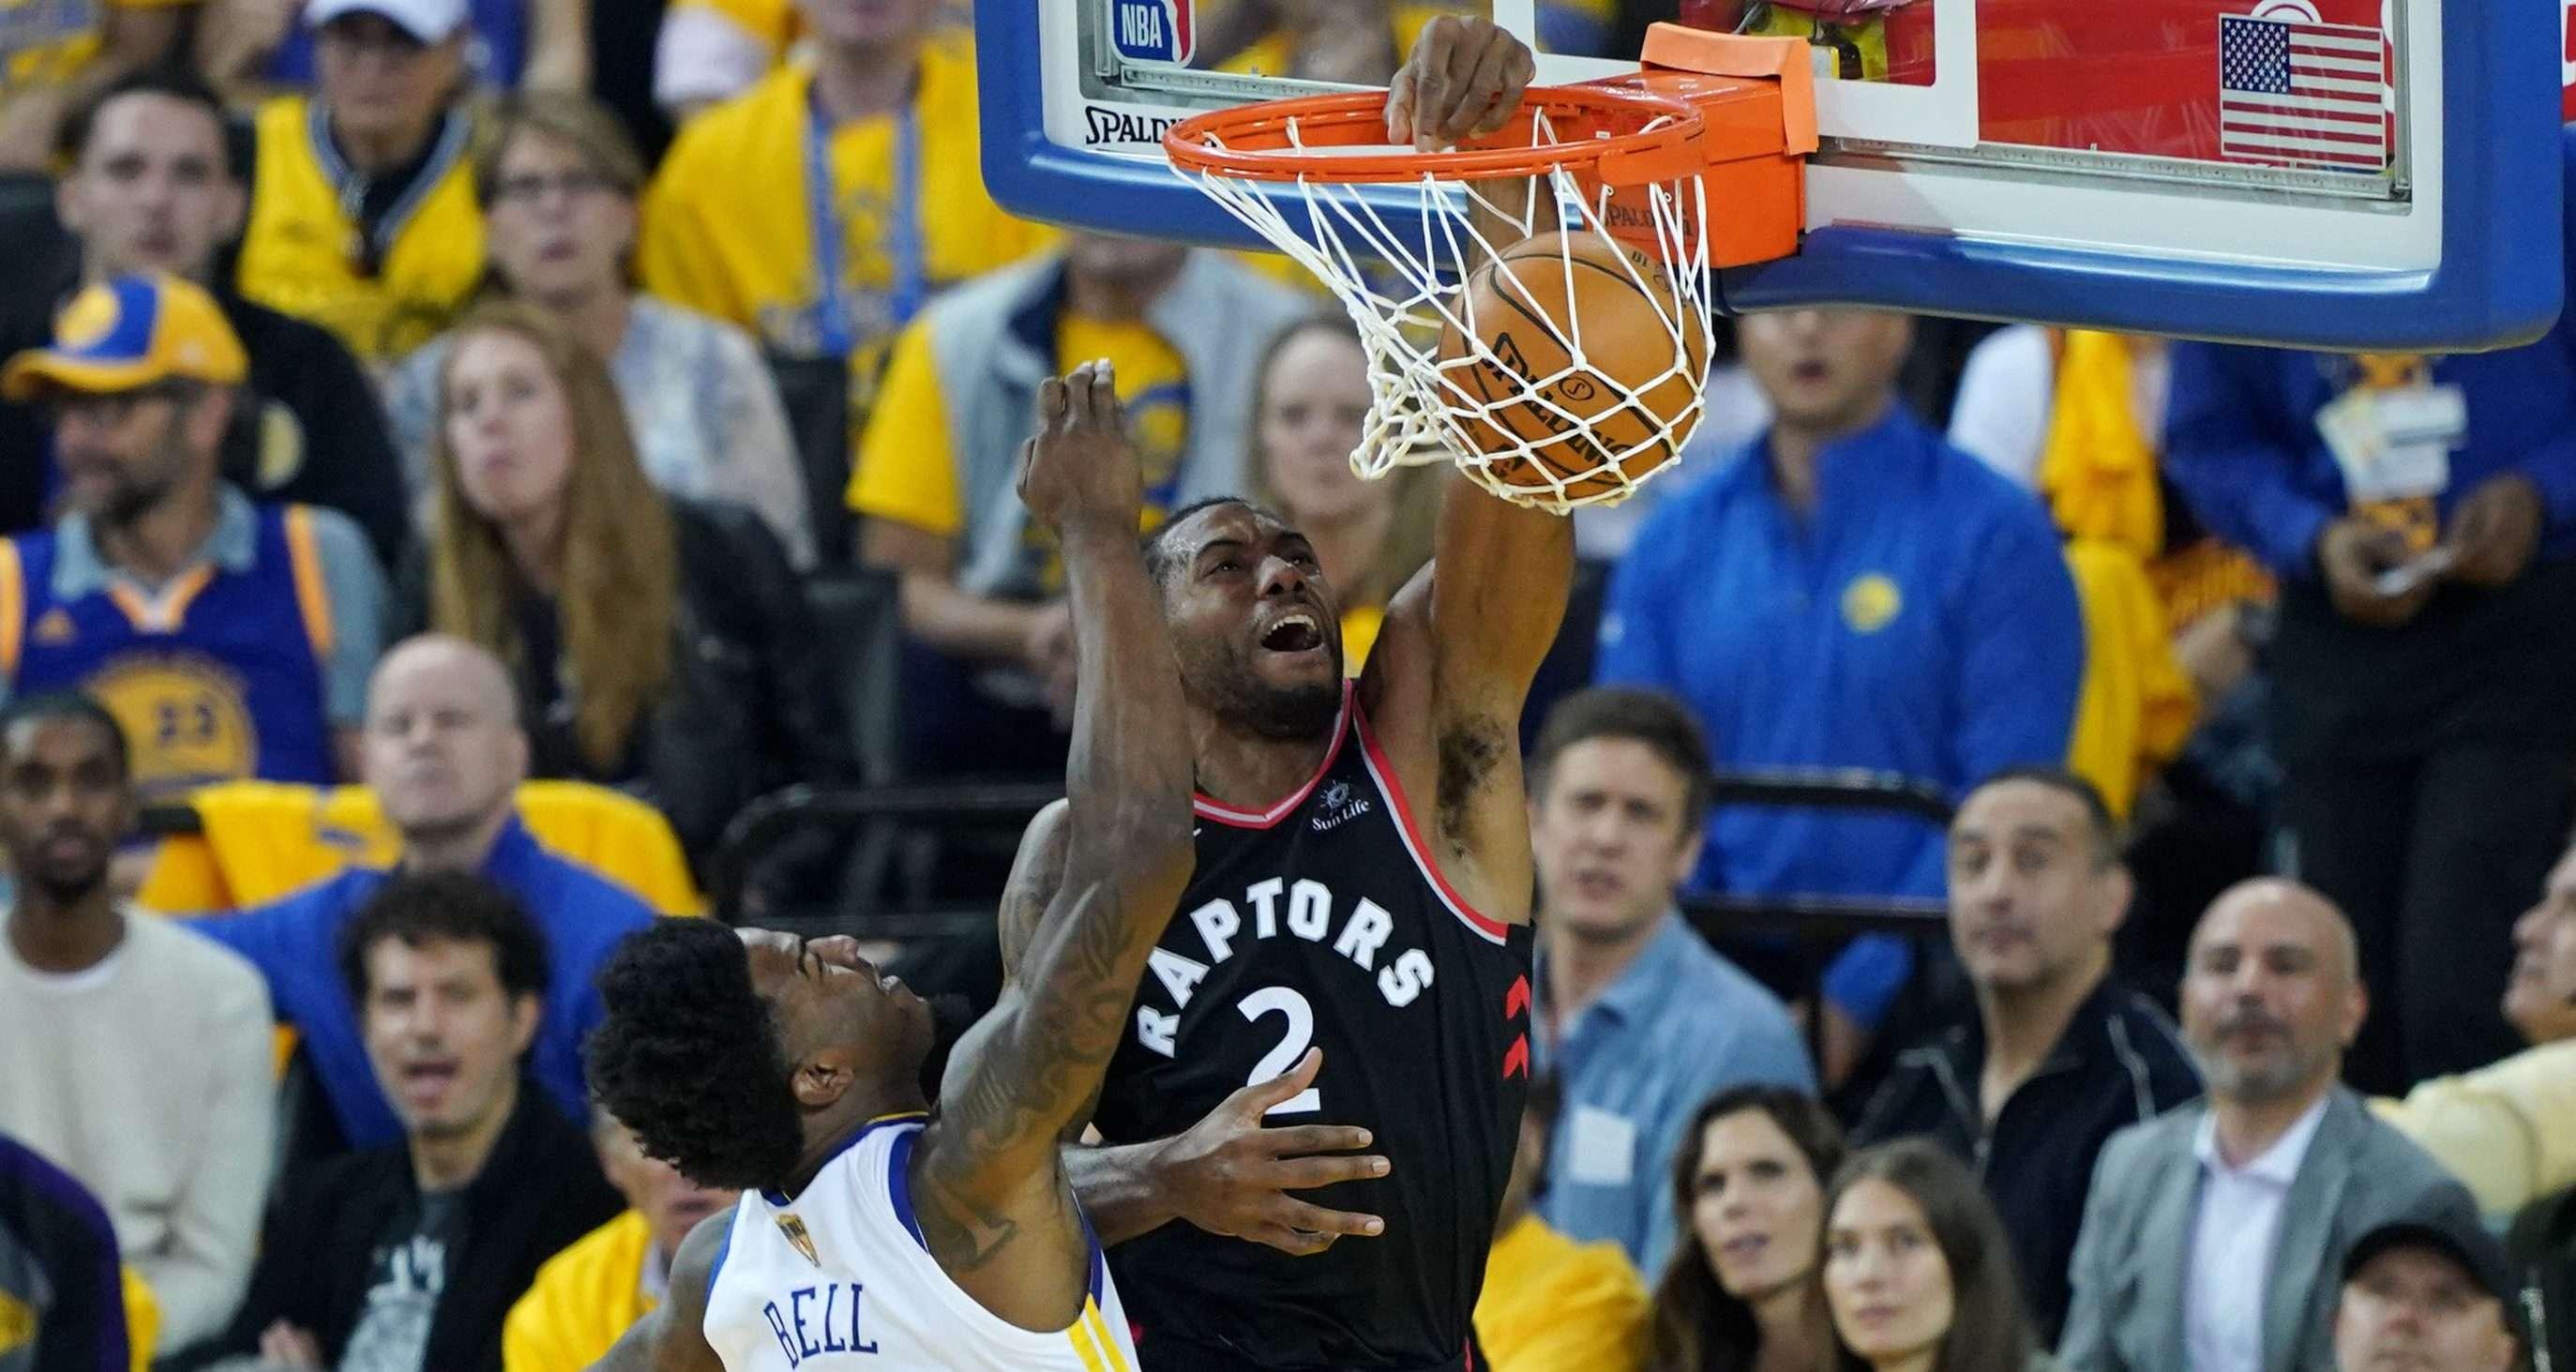 Kawhi Leonard-NBA Finals-Toronto Raptors-Golden State Warriors-Kyle Lowry-Steph Curry-Game 3-